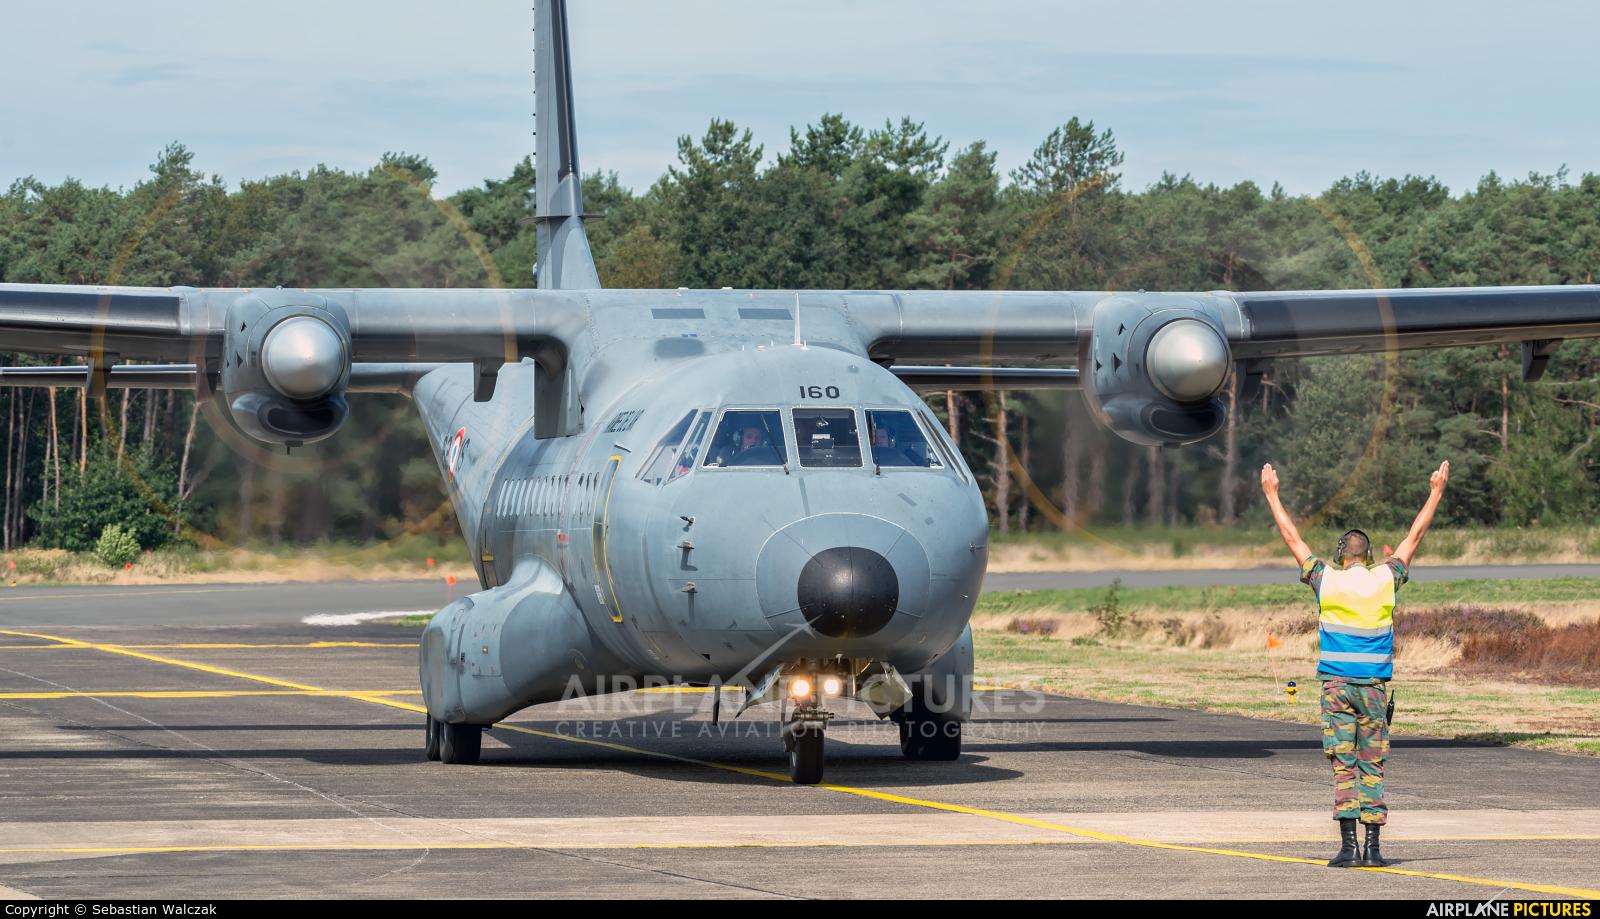 France - Air Force 160 aircraft at Kleine Brogel